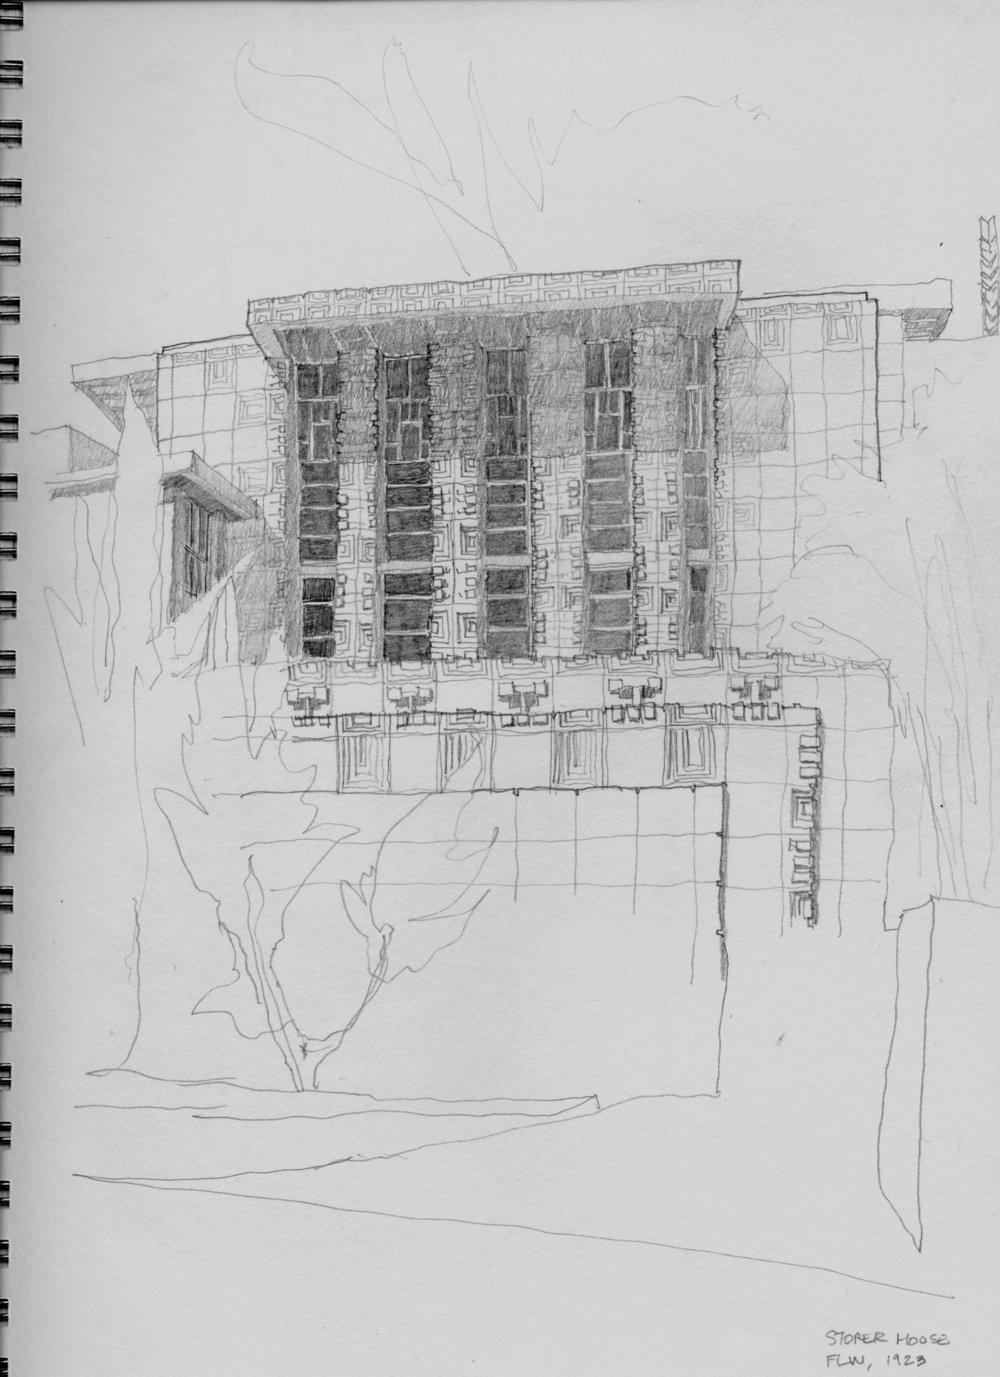 Storer House sketch